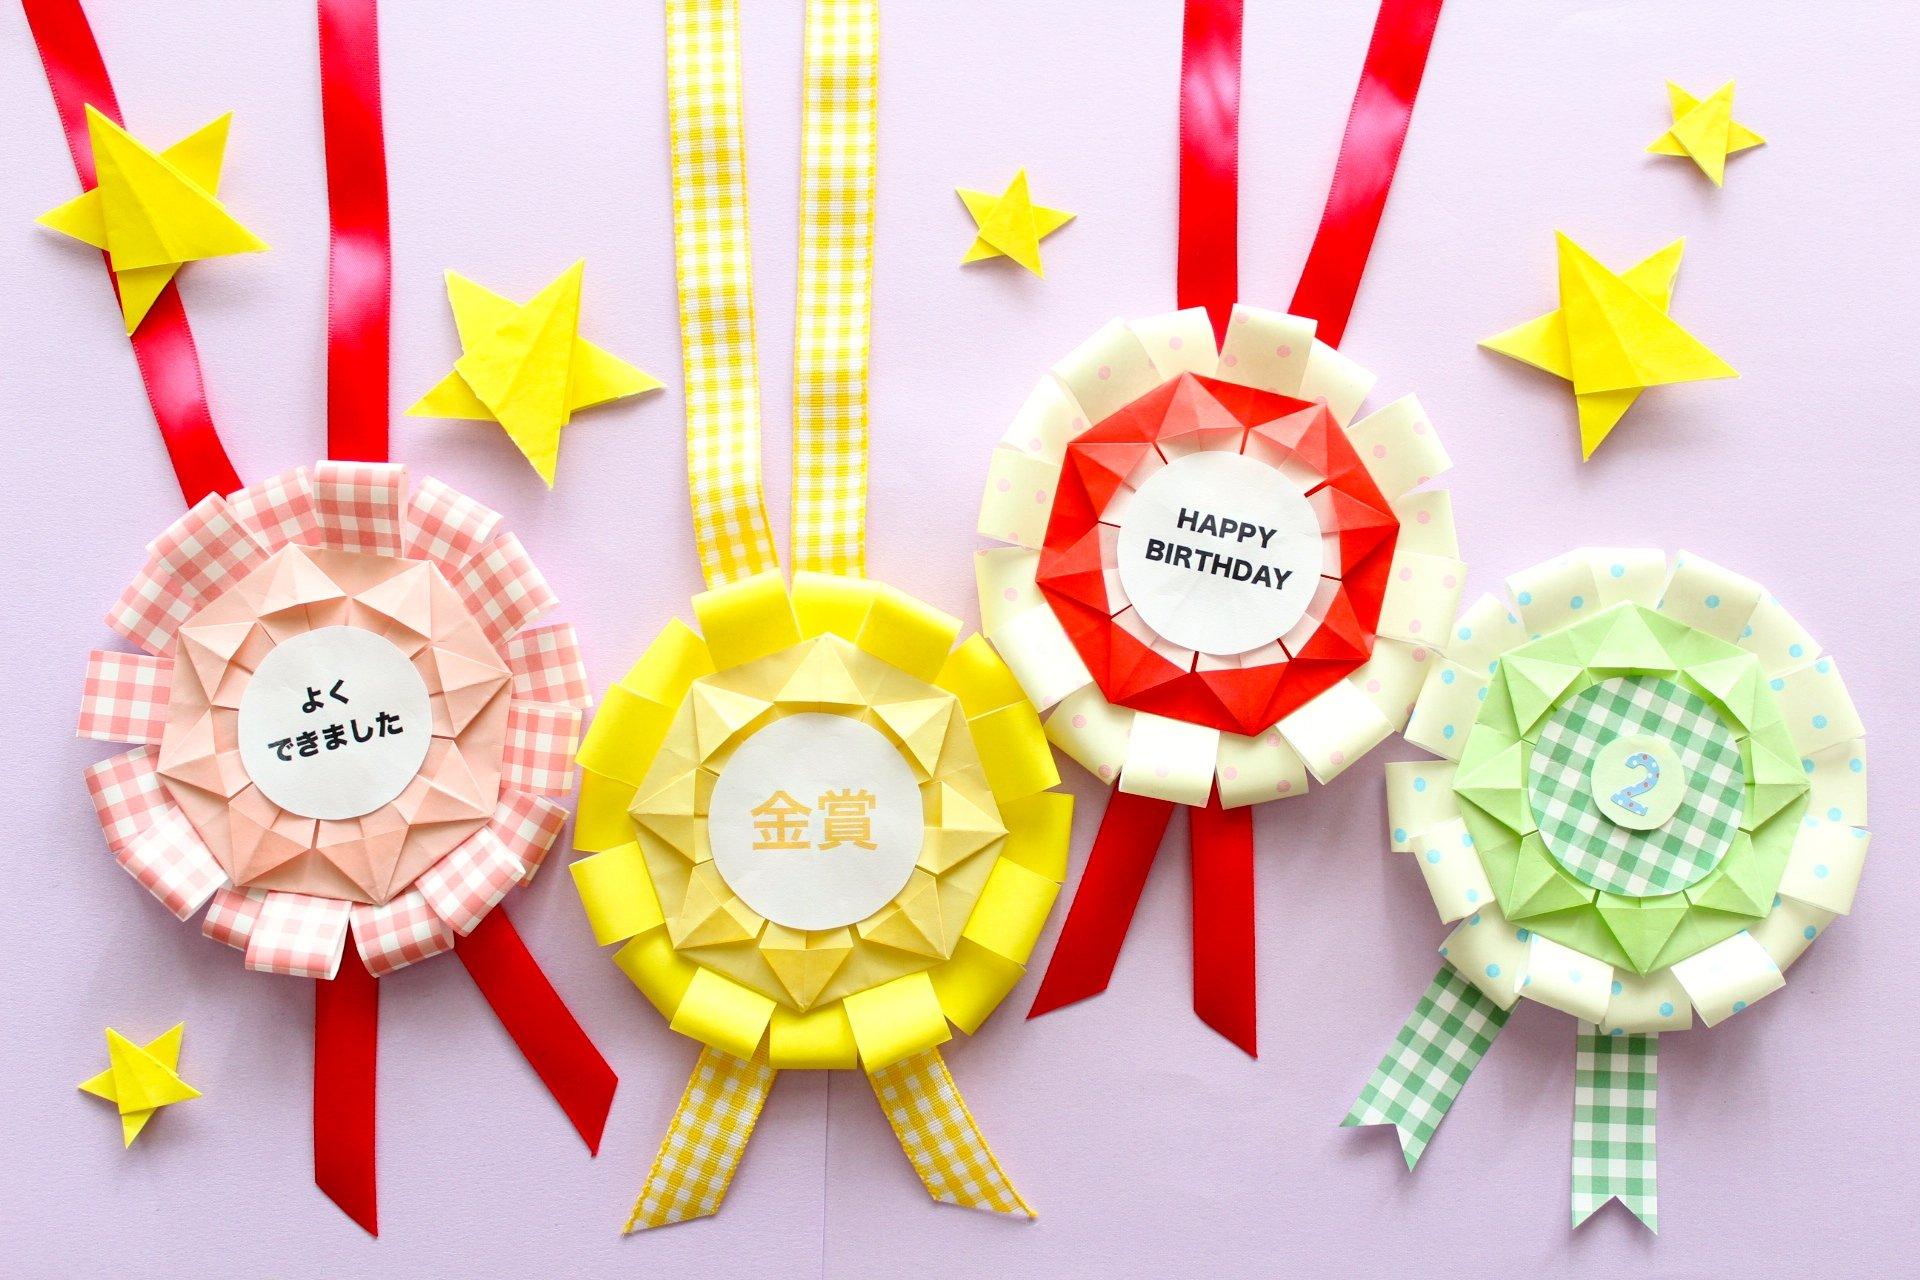 1 498.jpg?resize=648,365 - 簡単にできる!折り紙のメダルの作り方